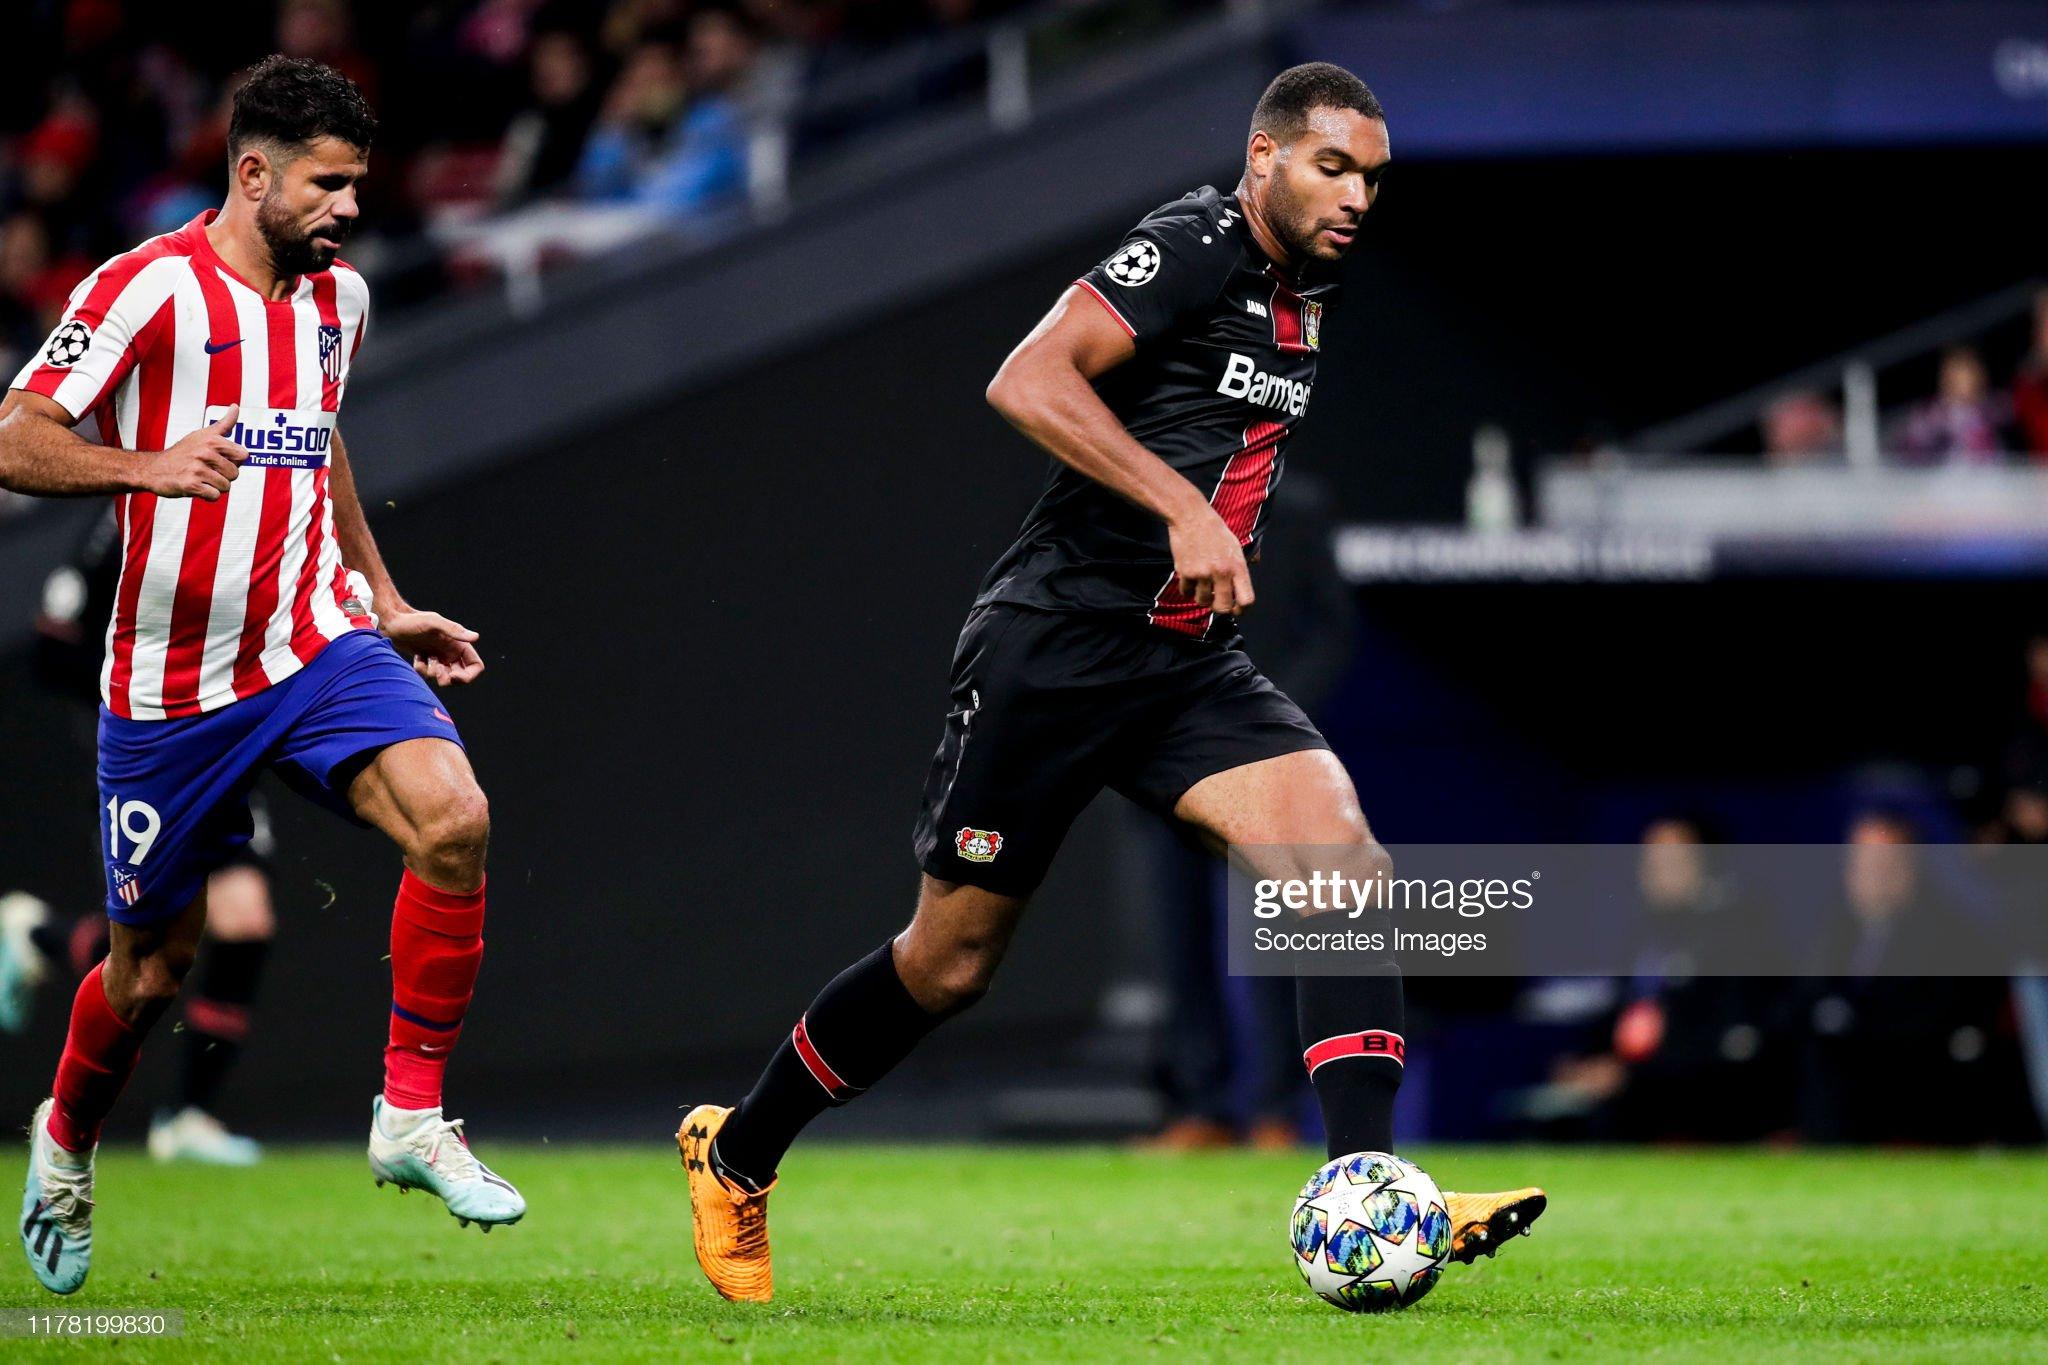 Bayer Leverkusen v Atletico Madrid preview, prediction and odds